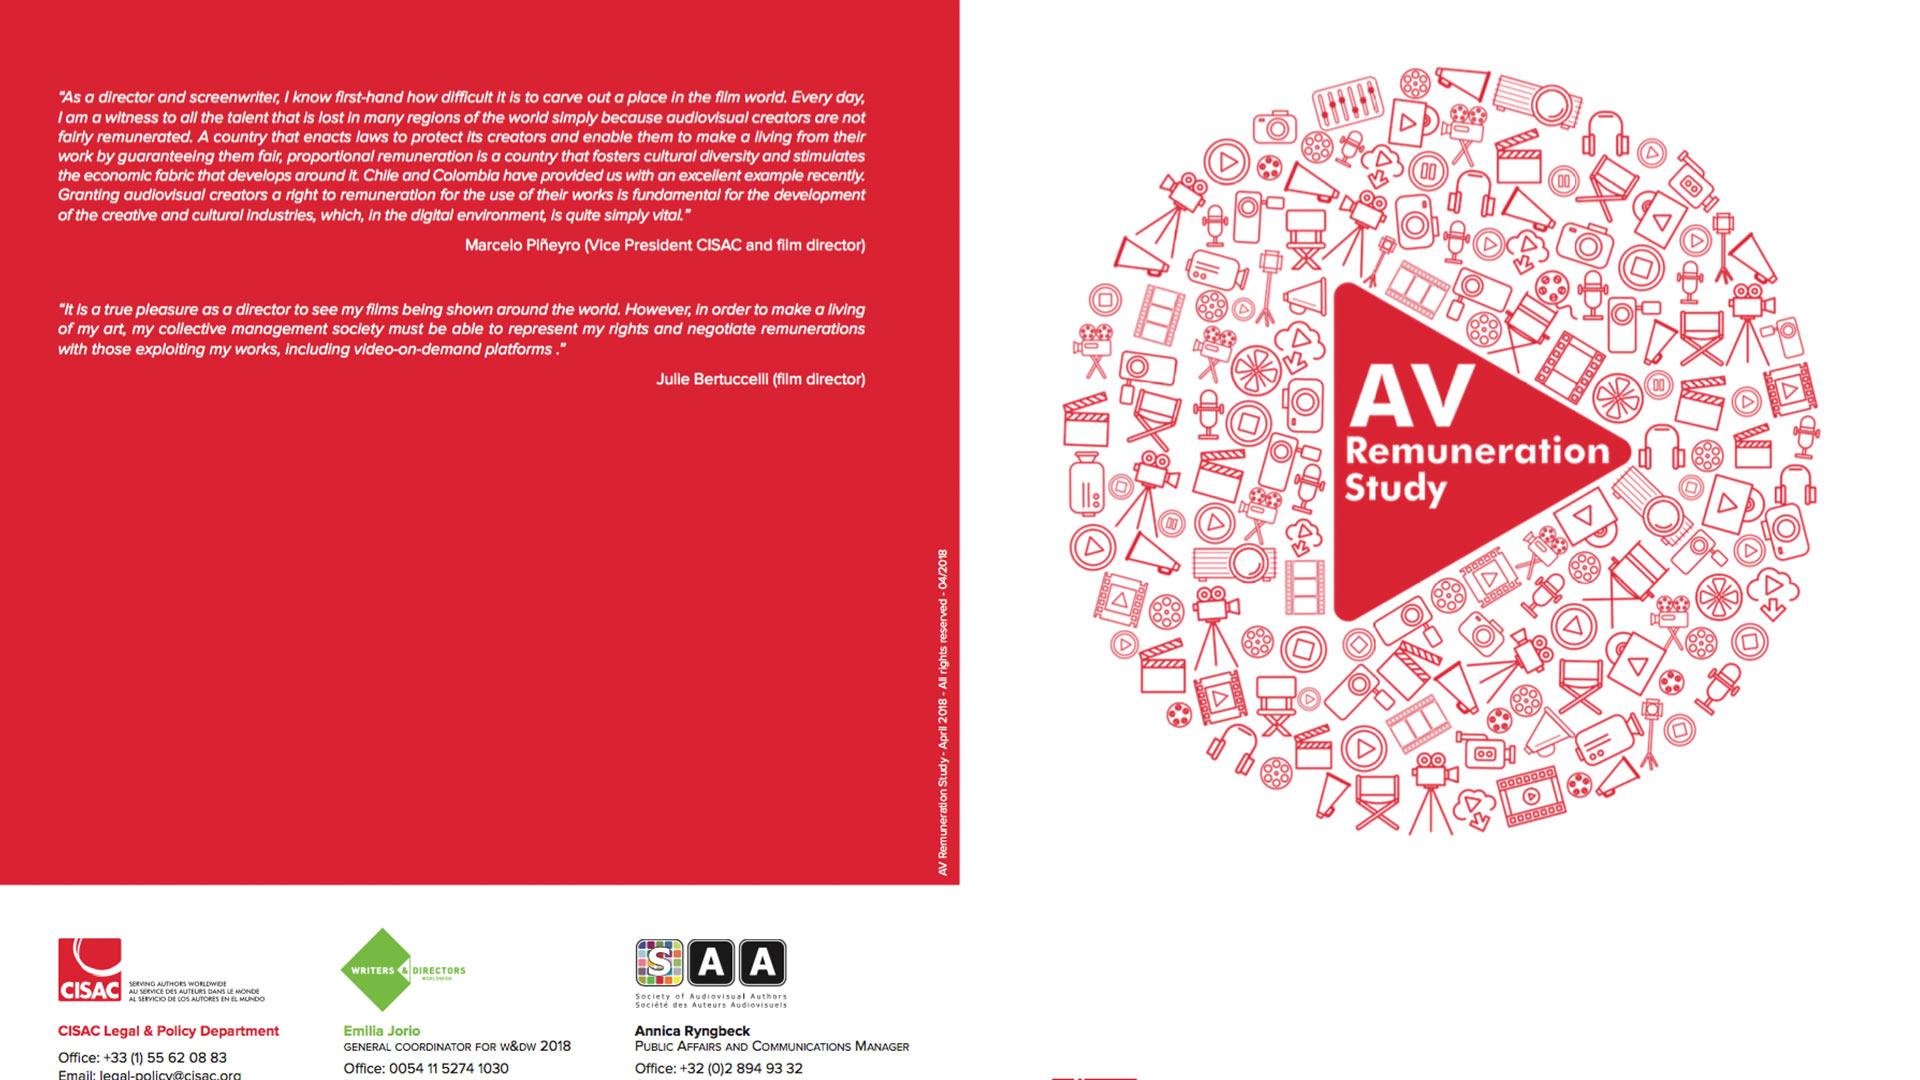 Fairness Rocks News AV Remuneration Study